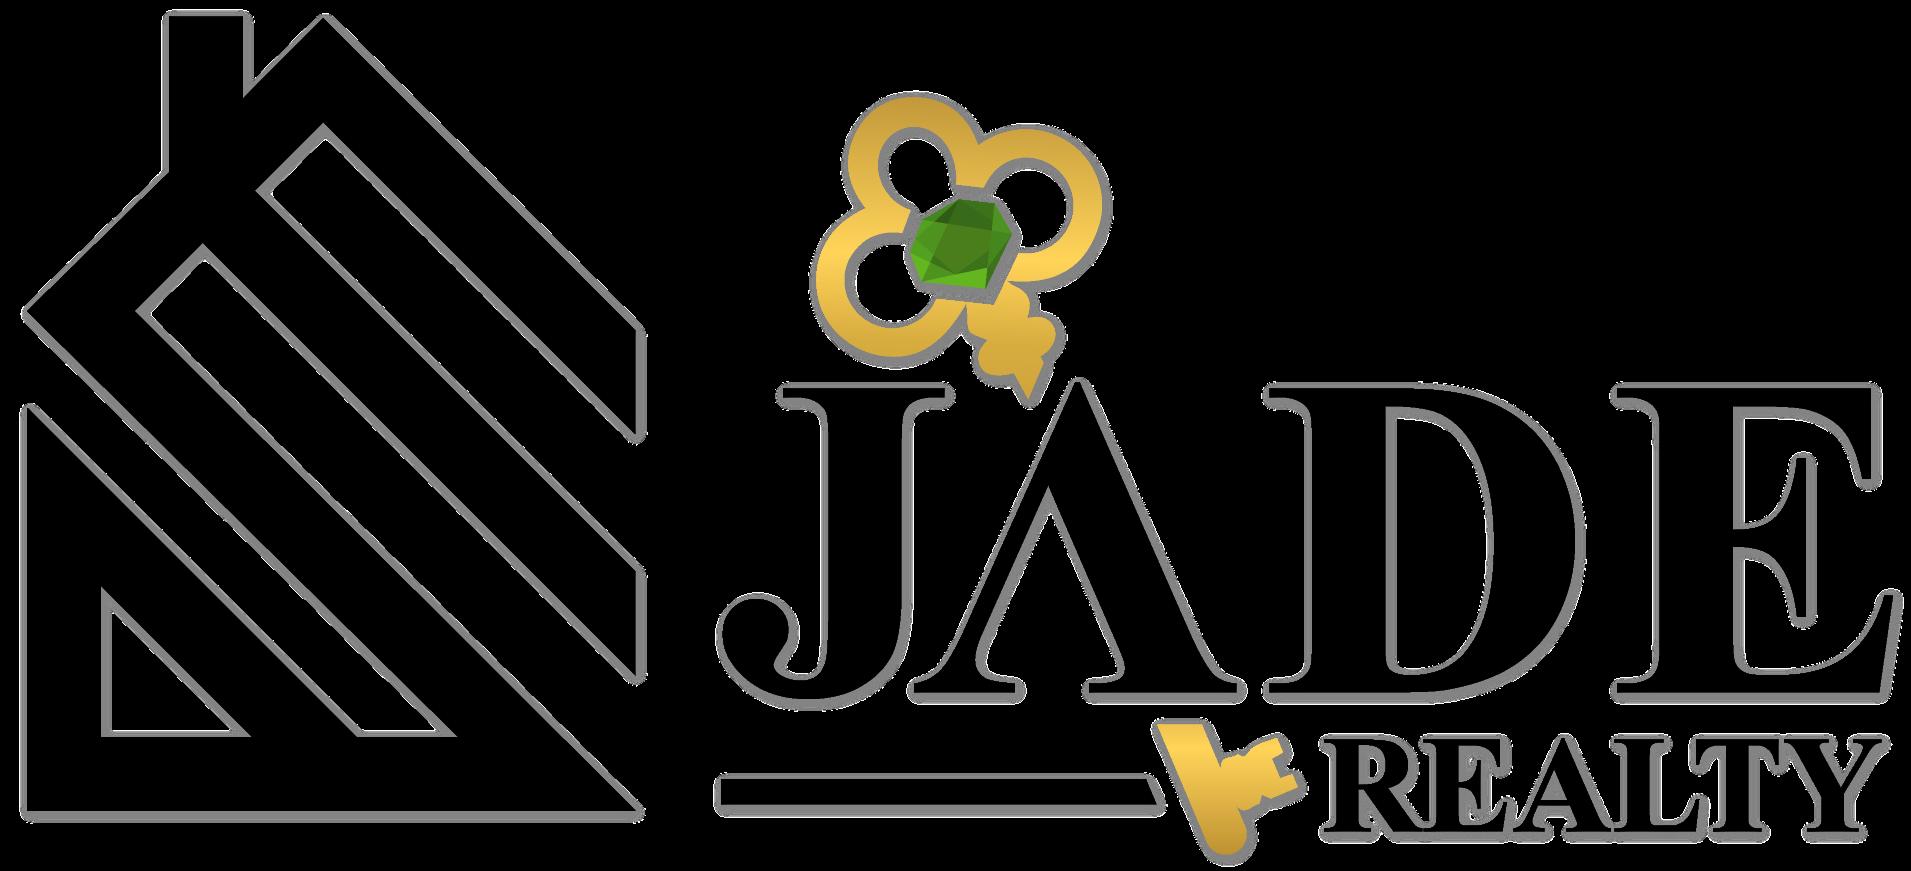 Jade Realty